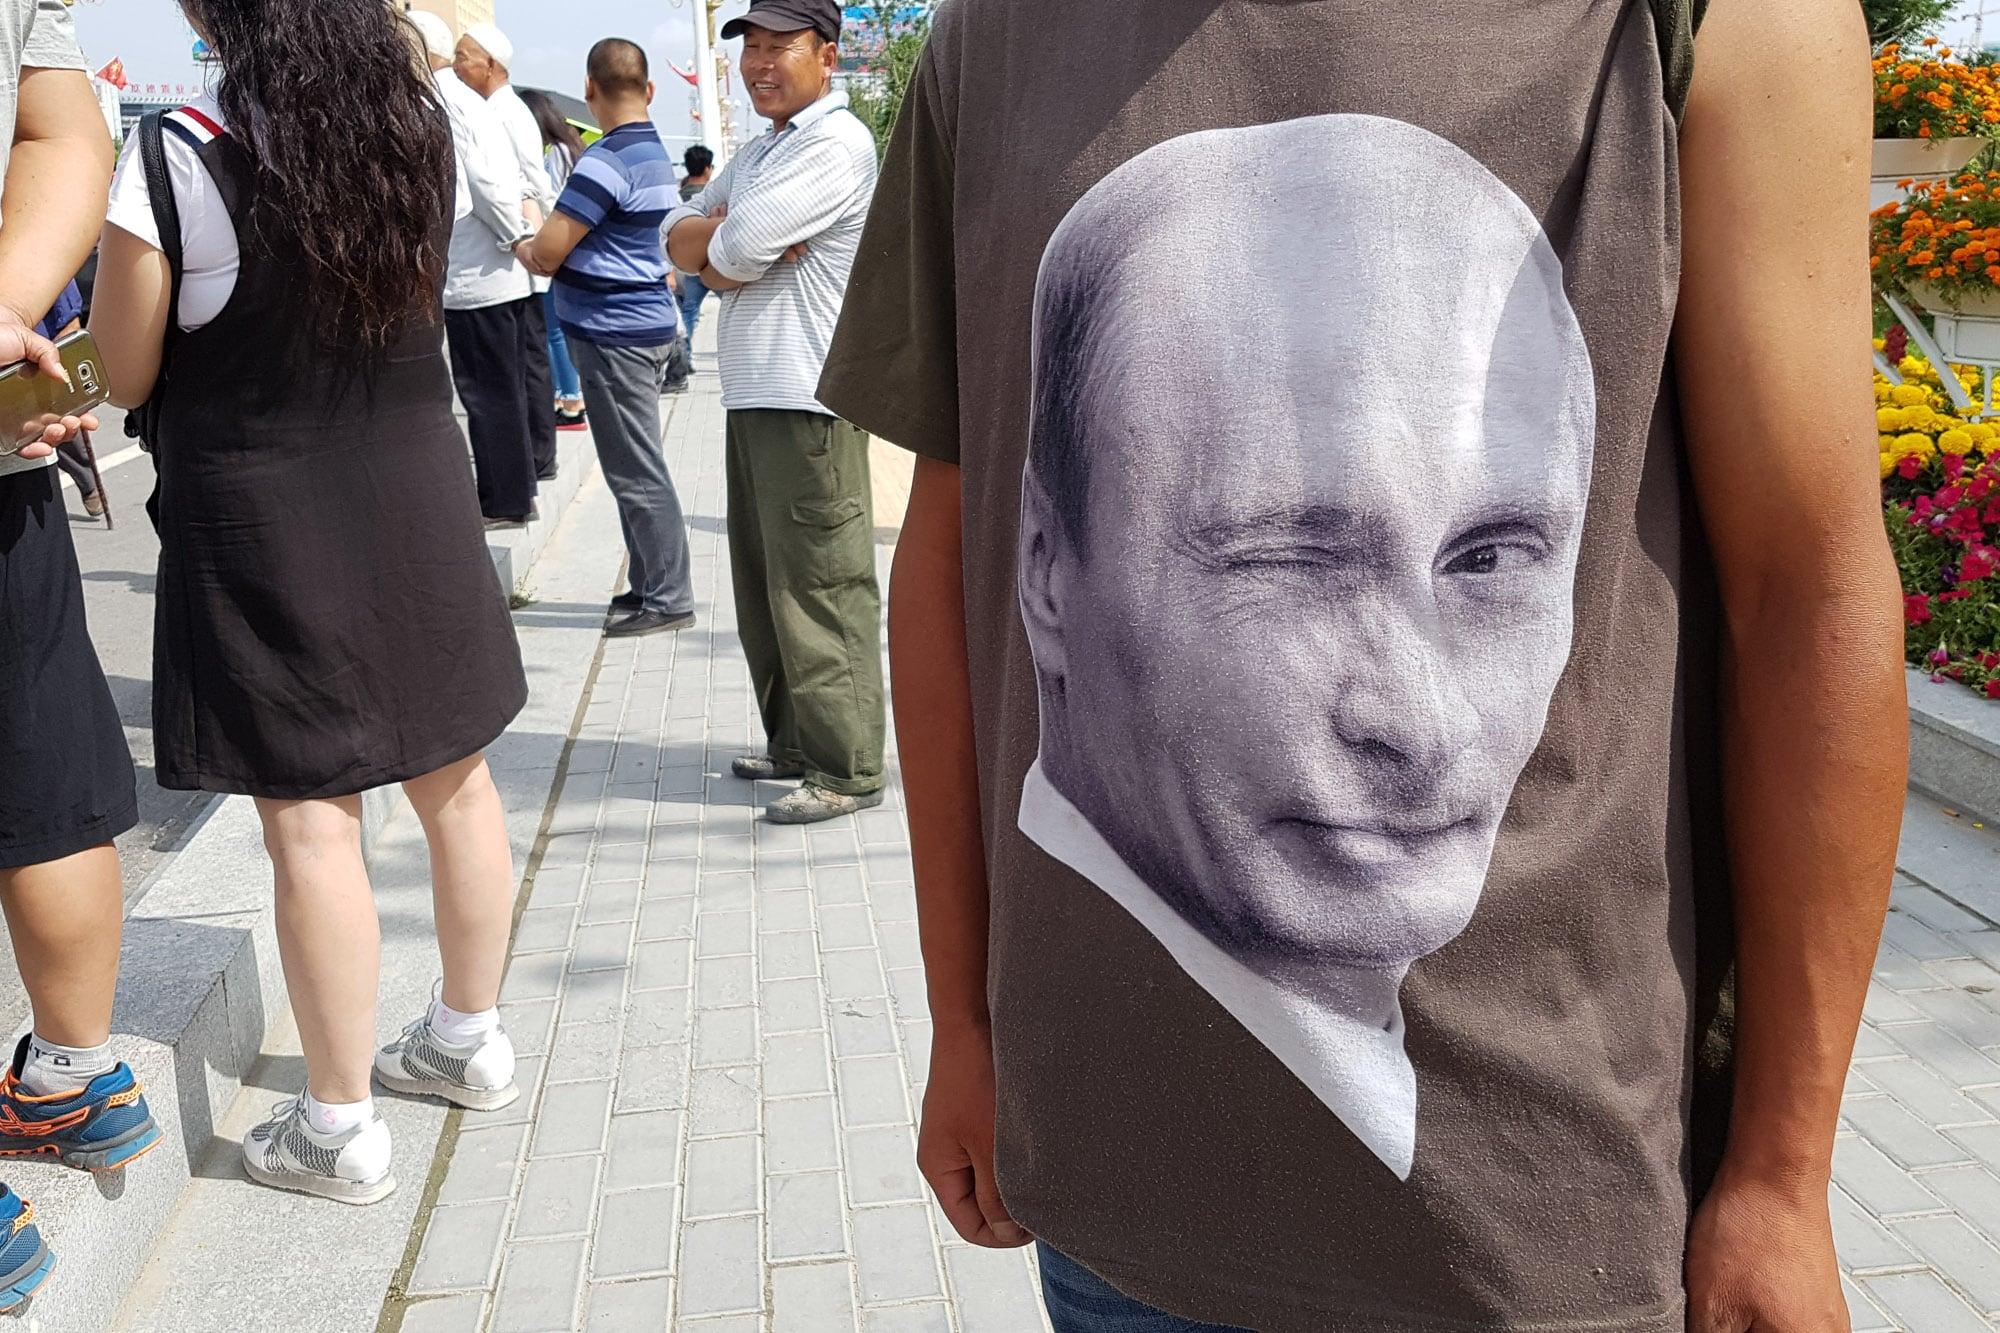 Putin shirt